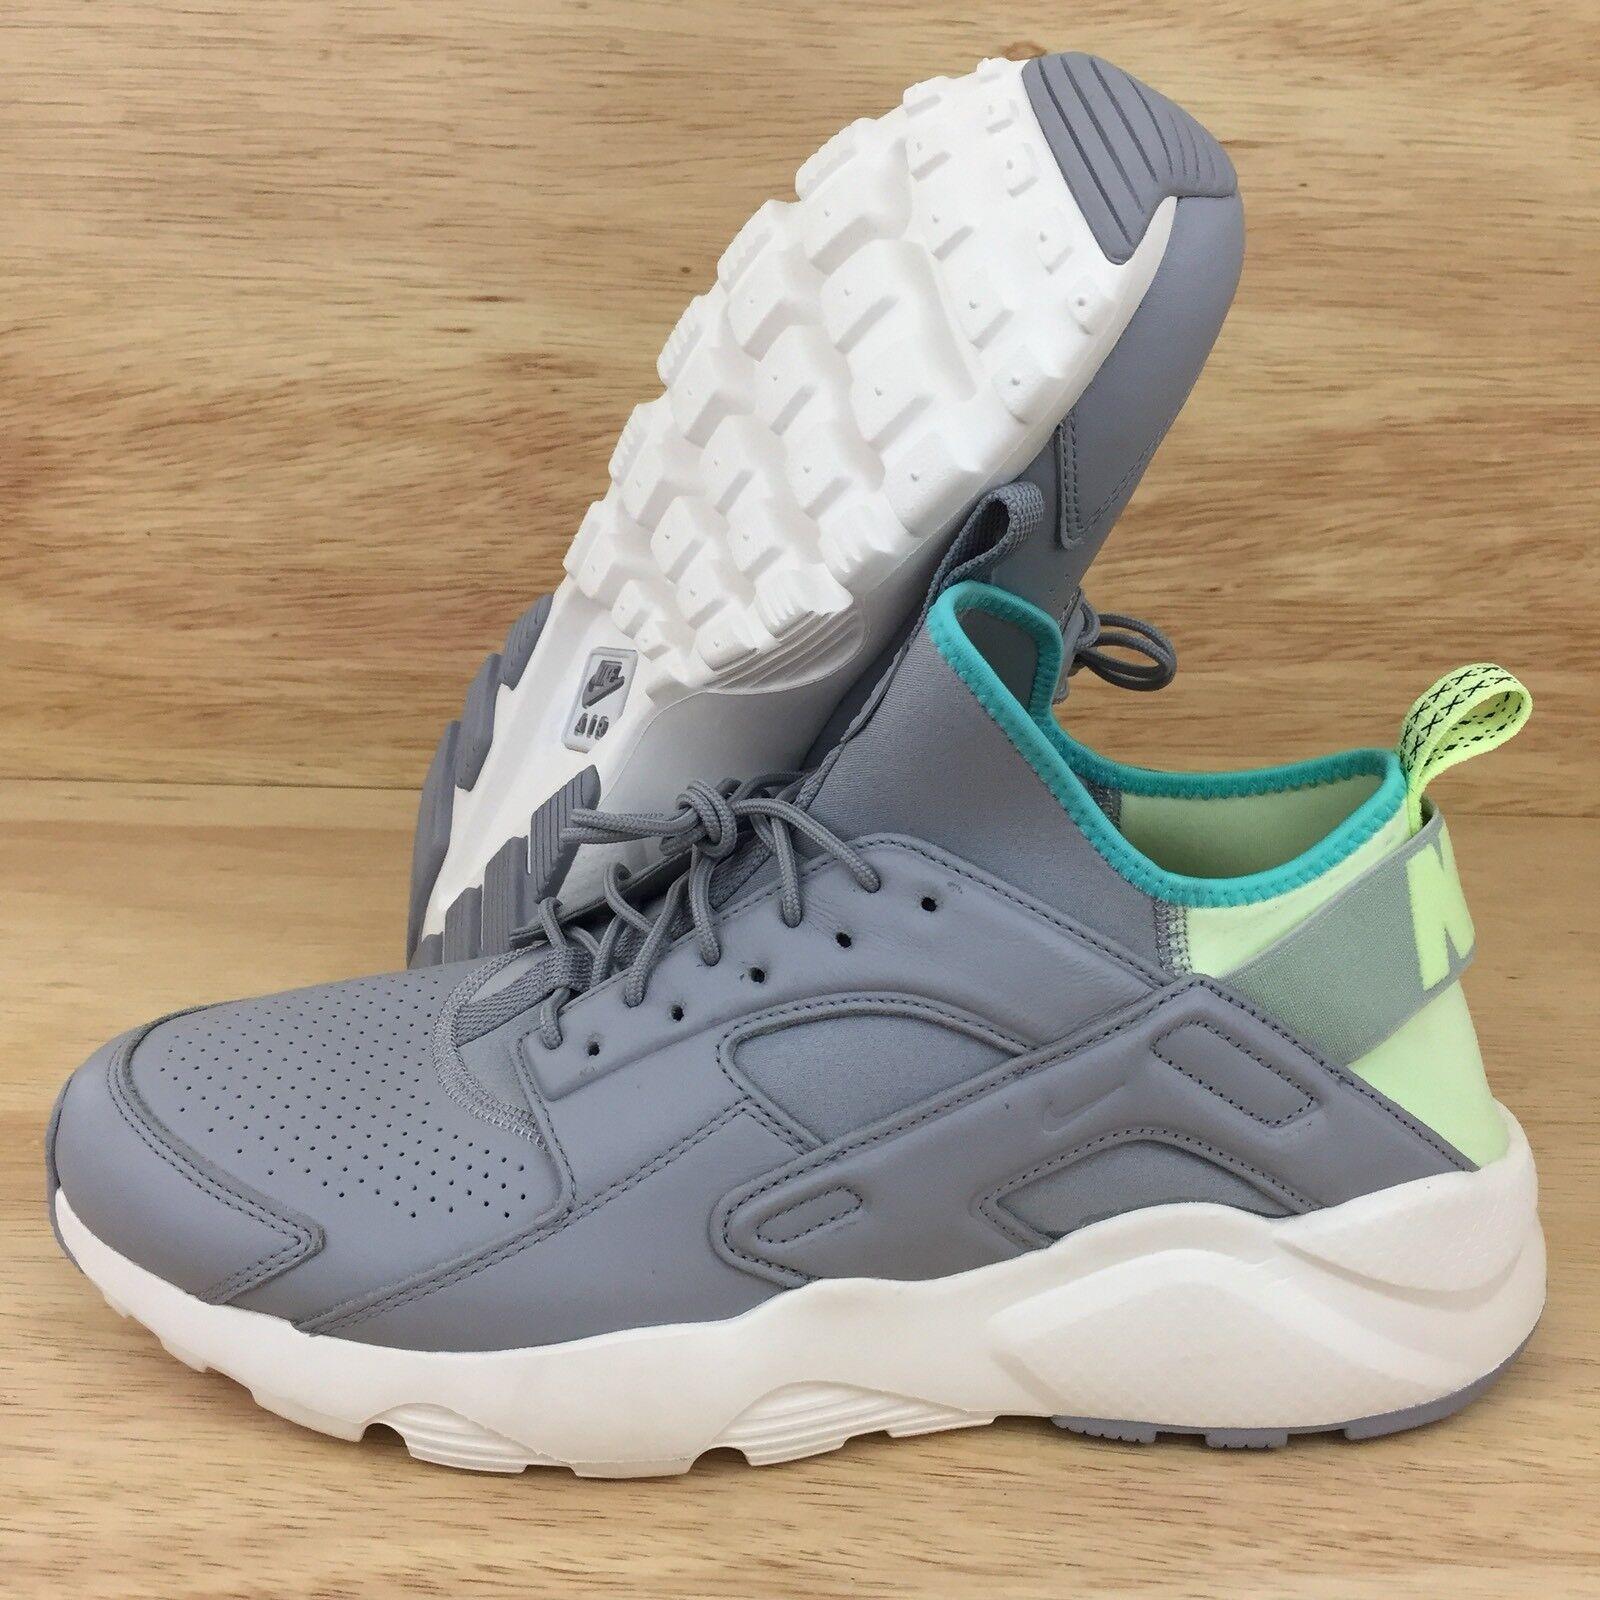 Nuove nike air huarache correre ultra Uomo Uomo Uomo scorpe 13 scarpe 875841 002 baba28